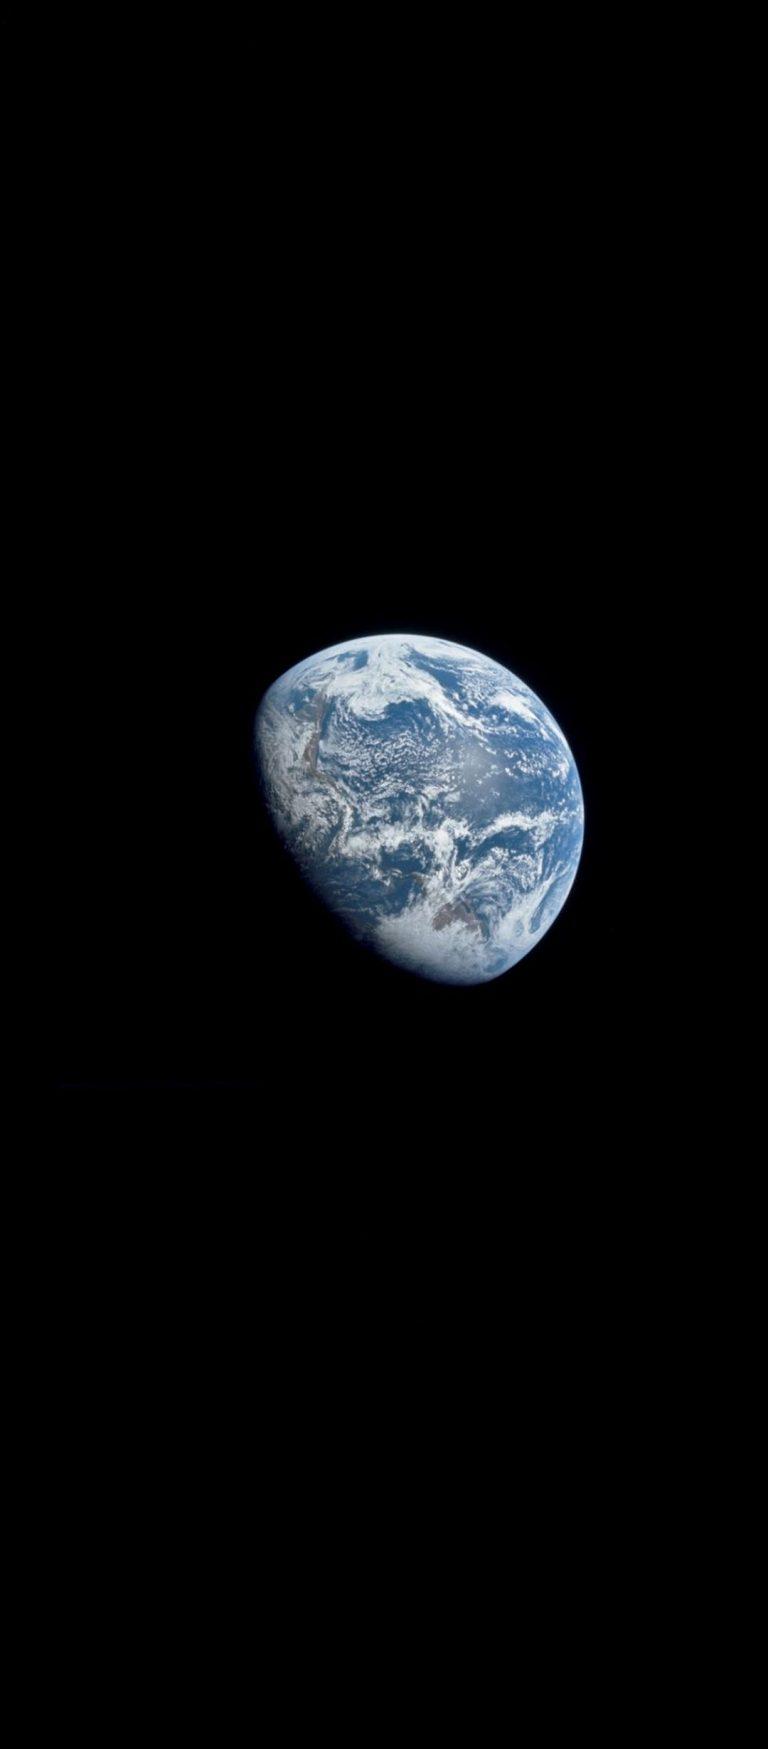 Space Earth Shadow 1080x2460 768x1749